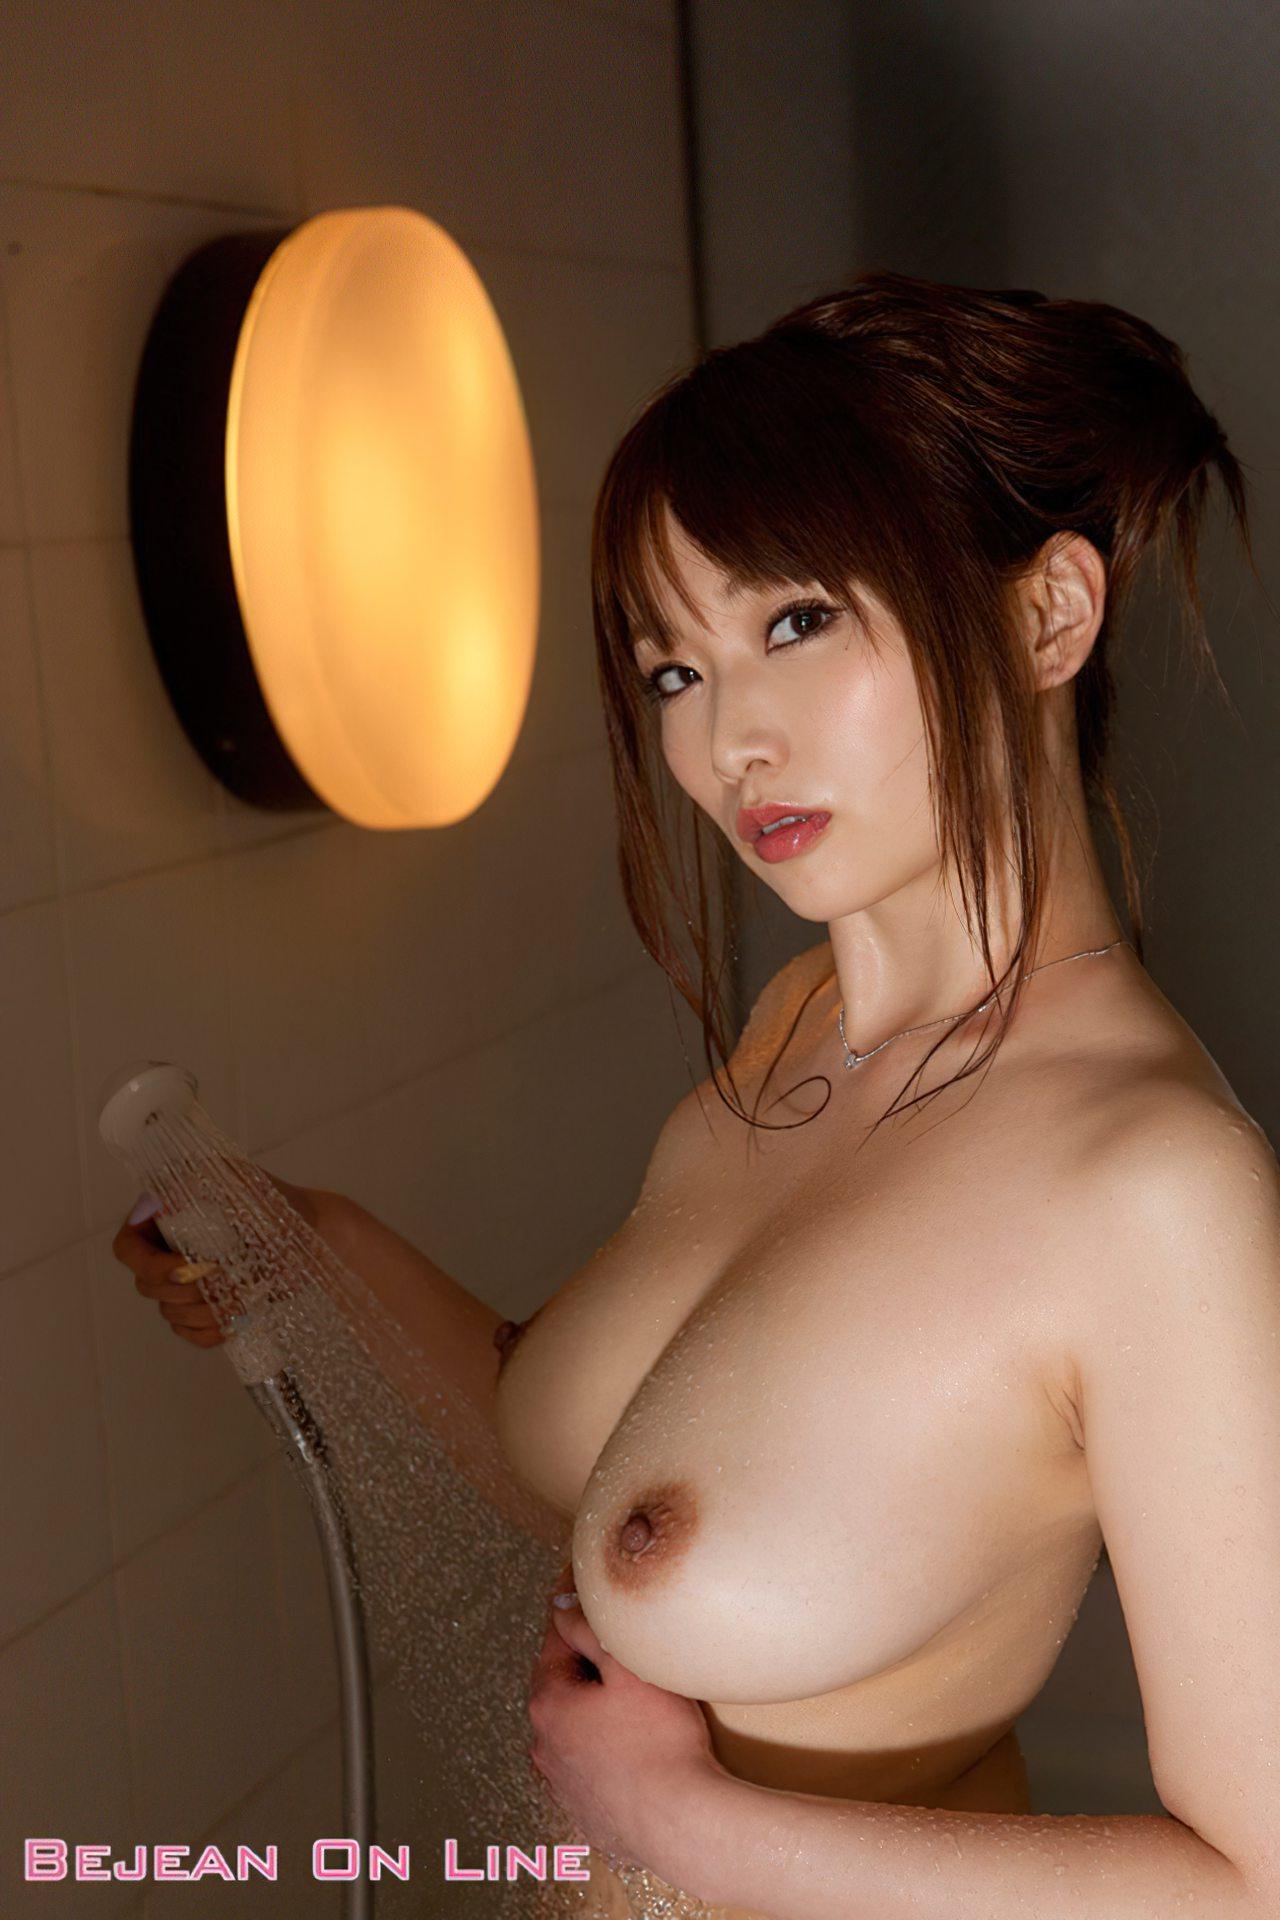 Japonesa Safada (38)